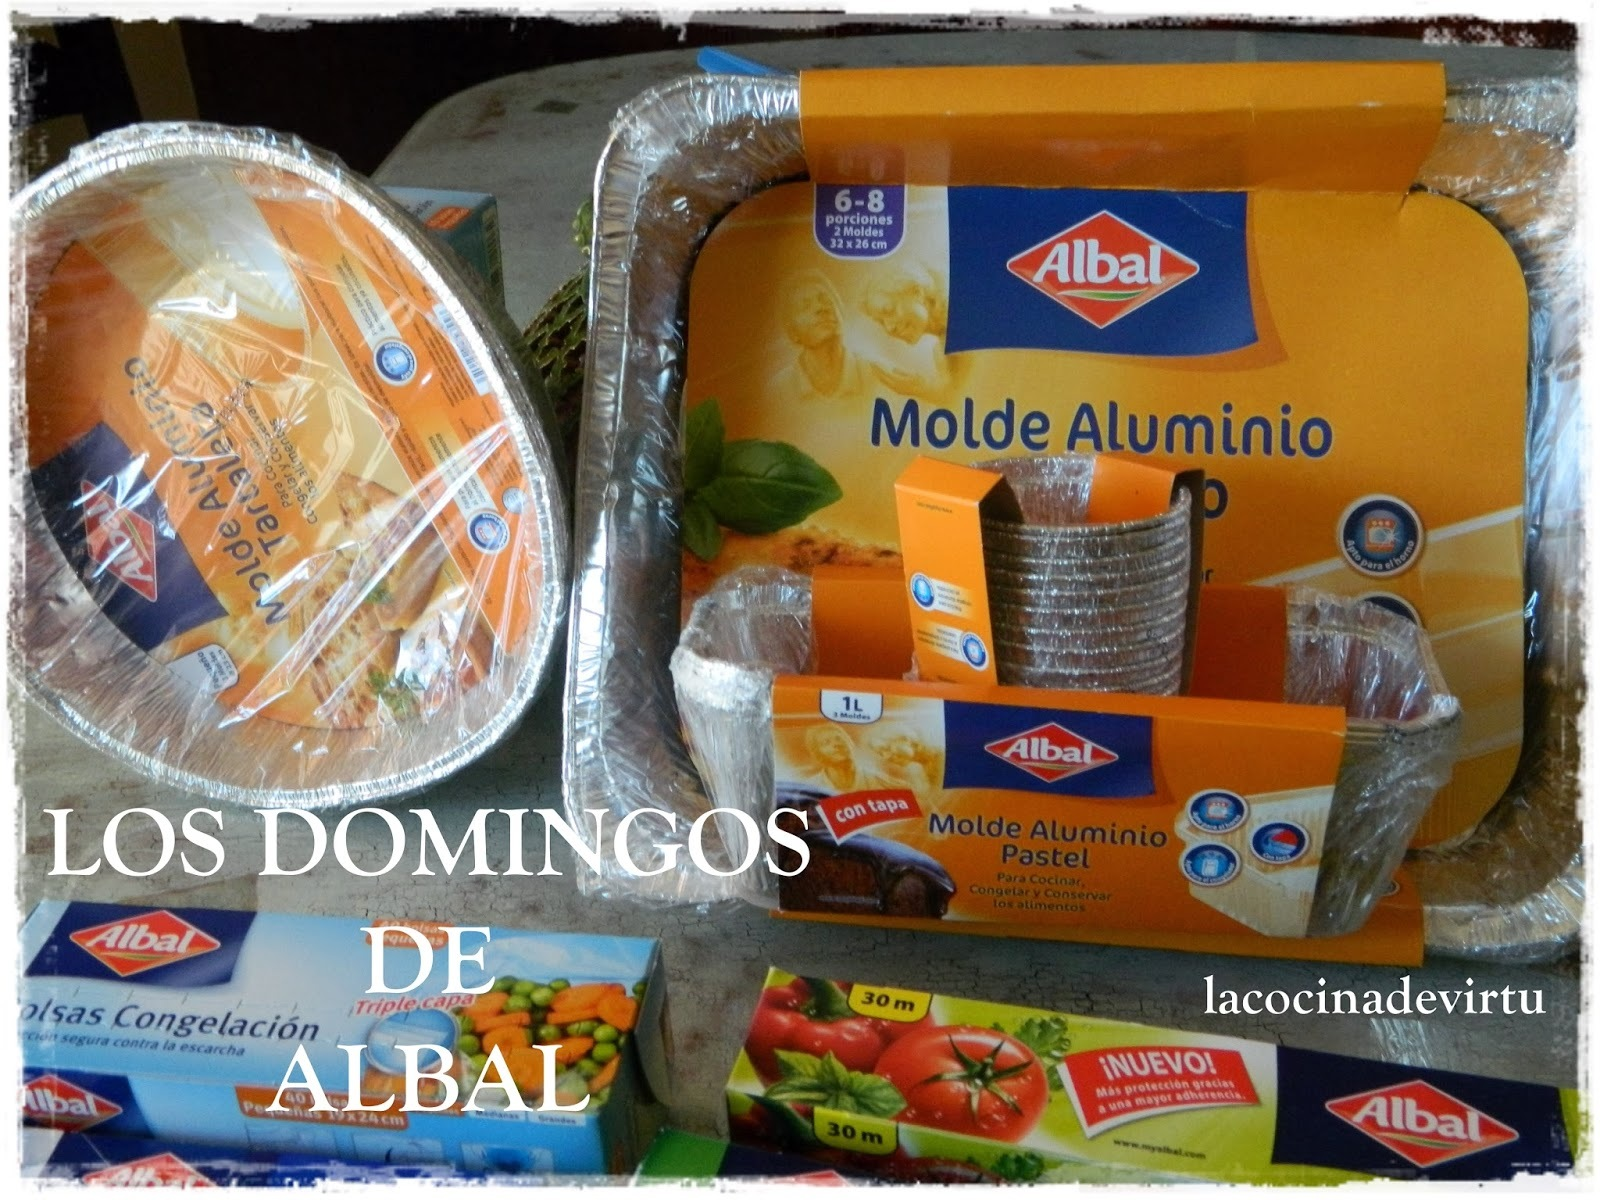 LOS DOMINGOS DE ALBAL: MOLDE ALUMINIO RECTANGULAR